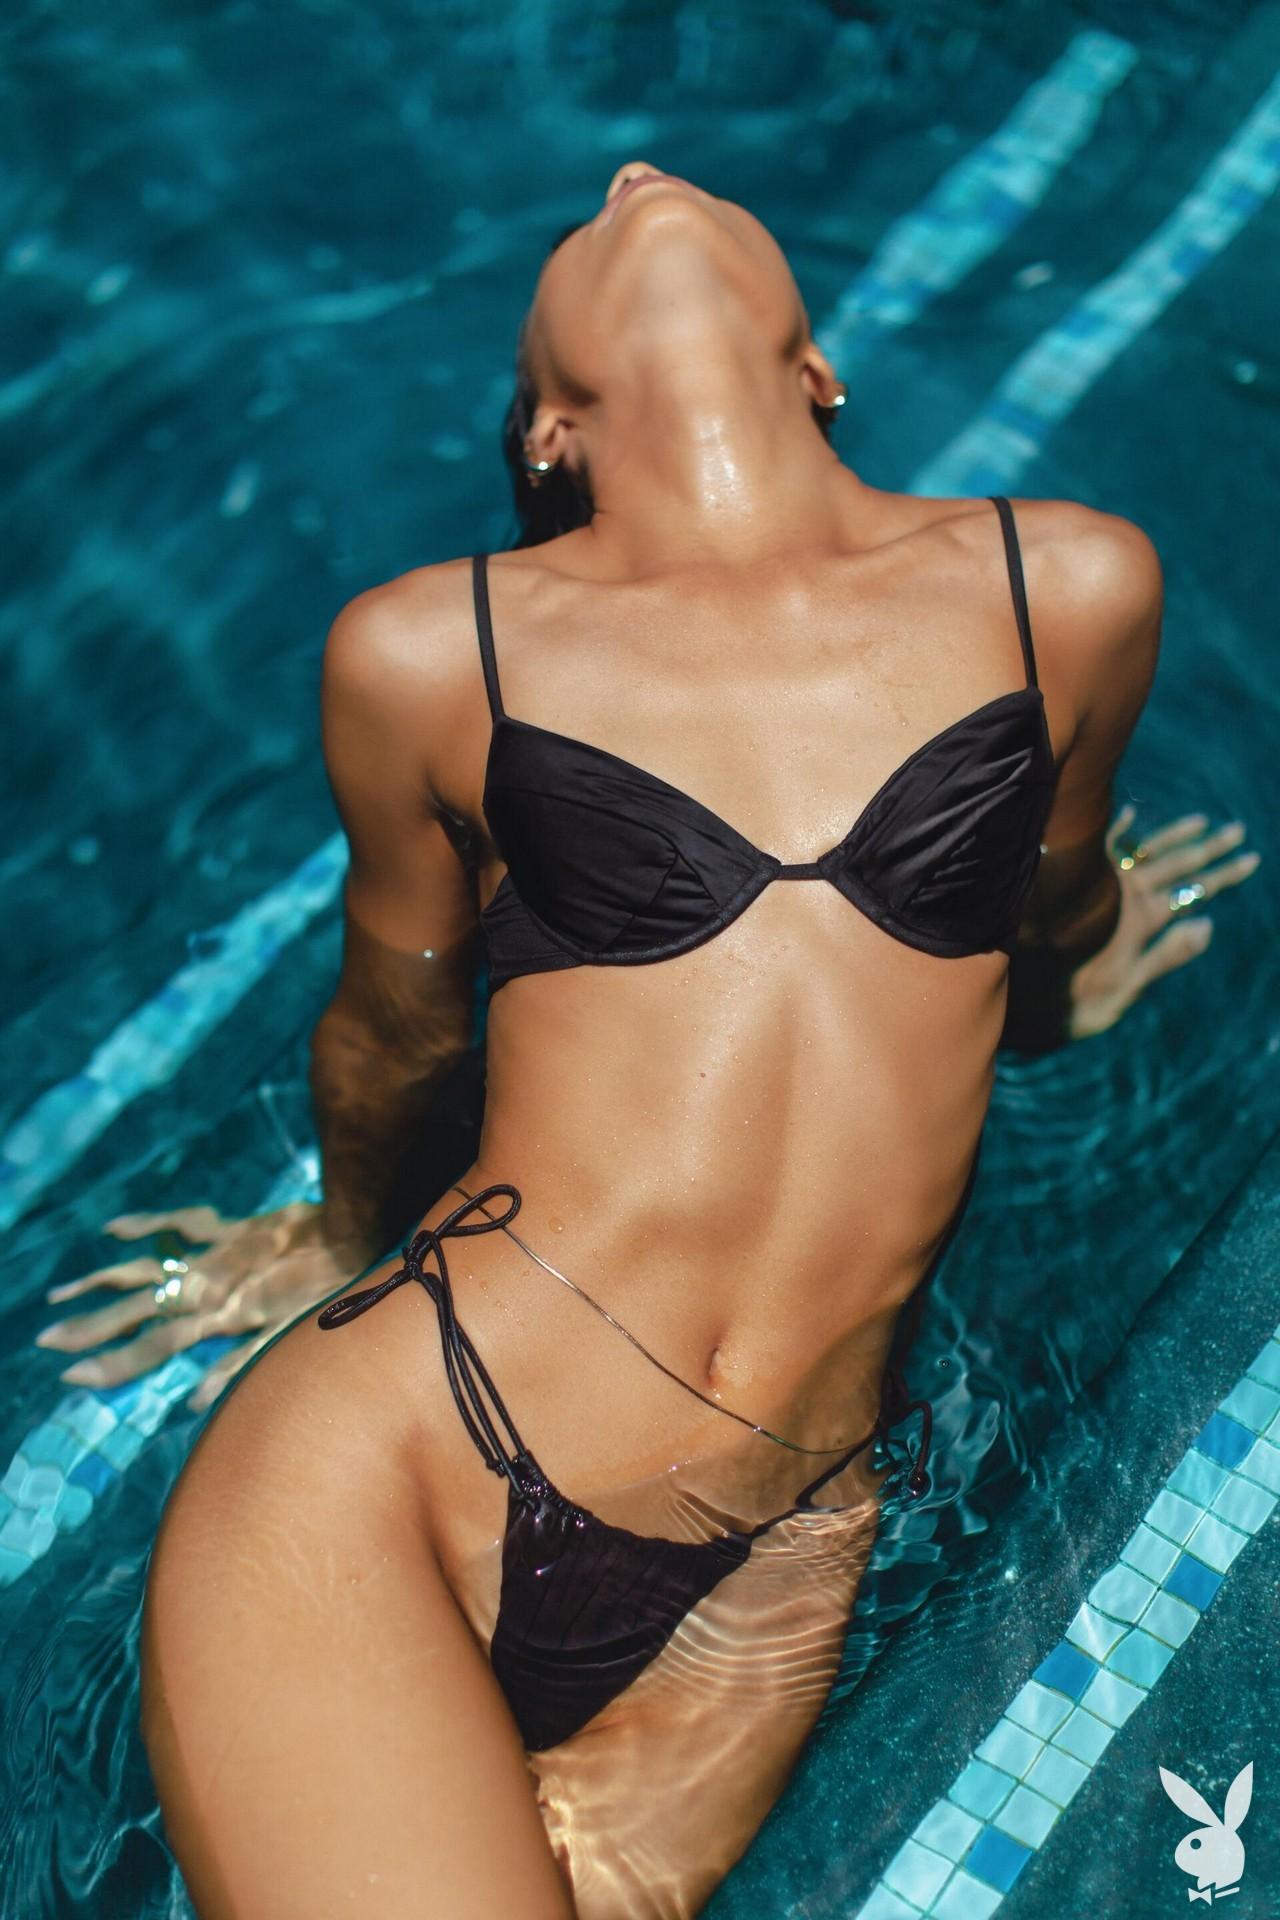 Danielle Alcaraz Playmate Outtakes Playboy Plus (6)